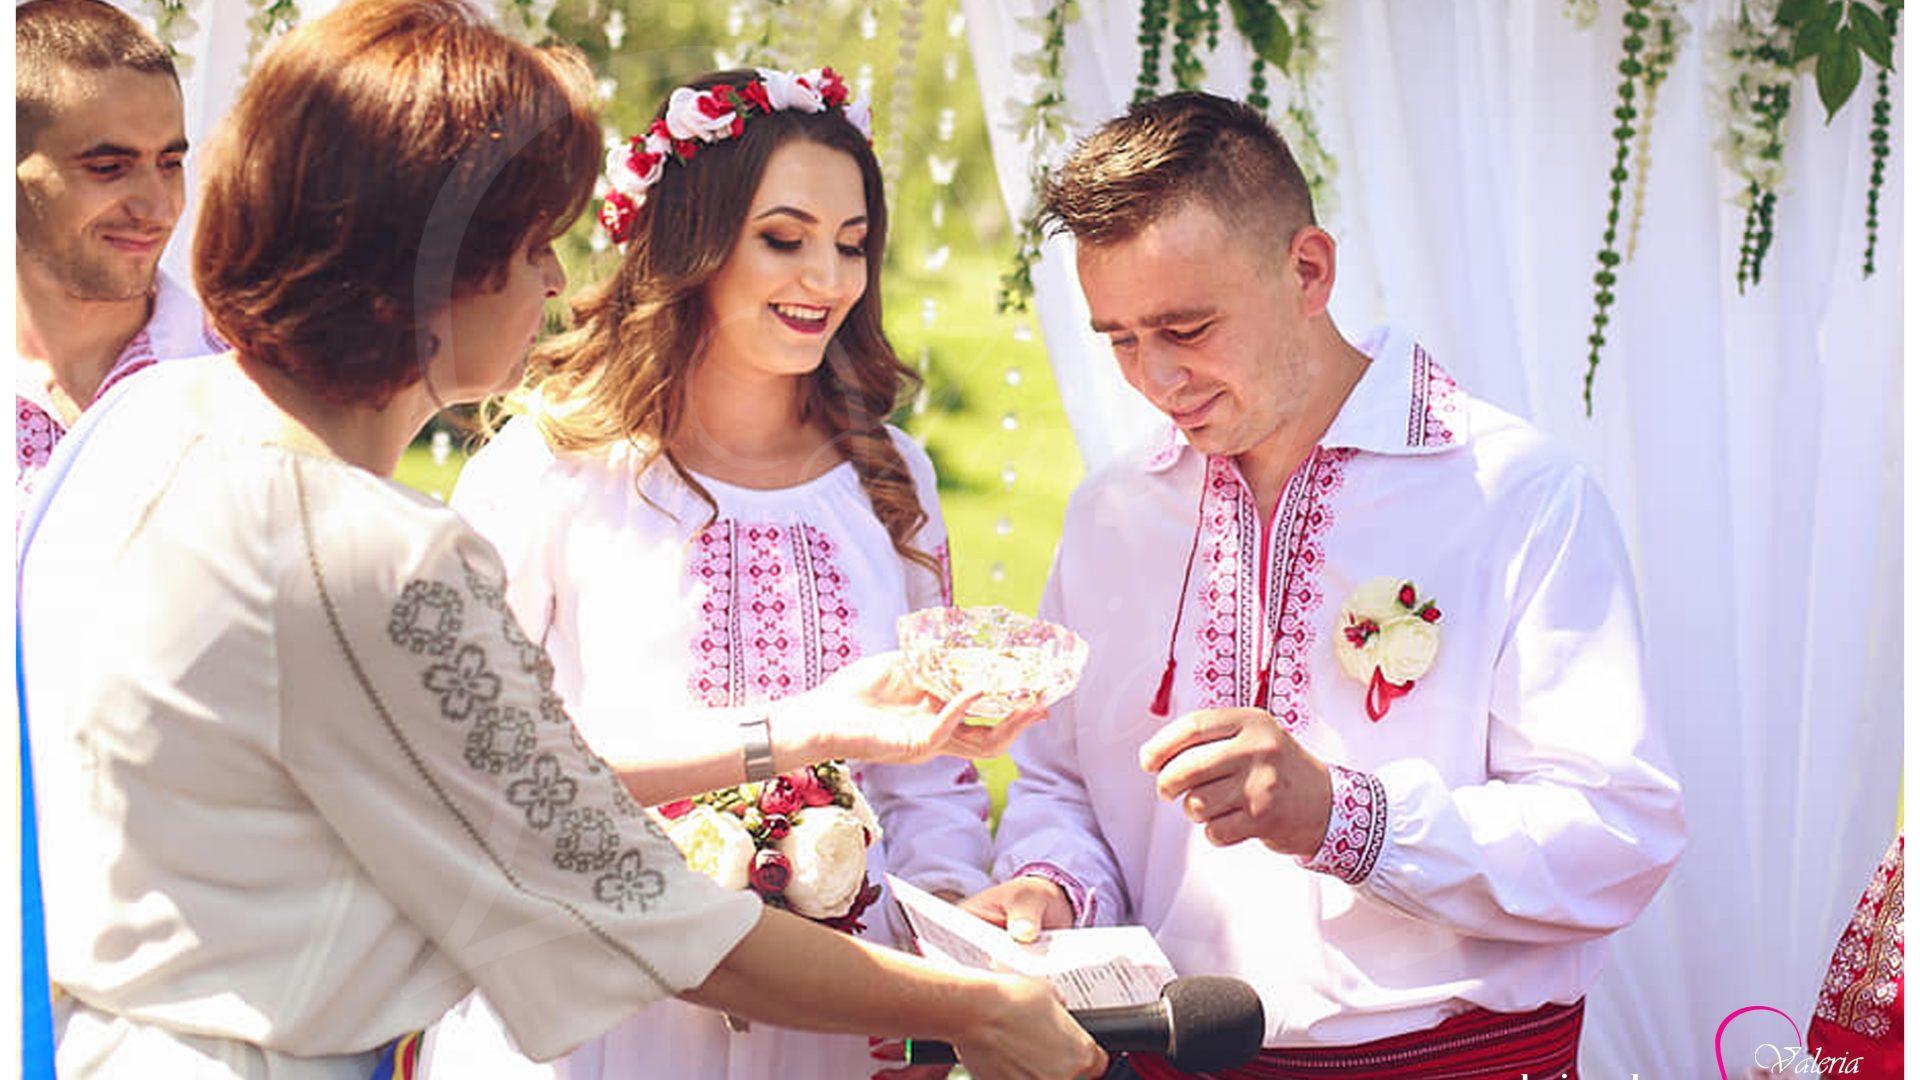 Inregistrarea casatoriei sub cerul liber Agentia Valeria Mariage 069787665 www.valeria (9)